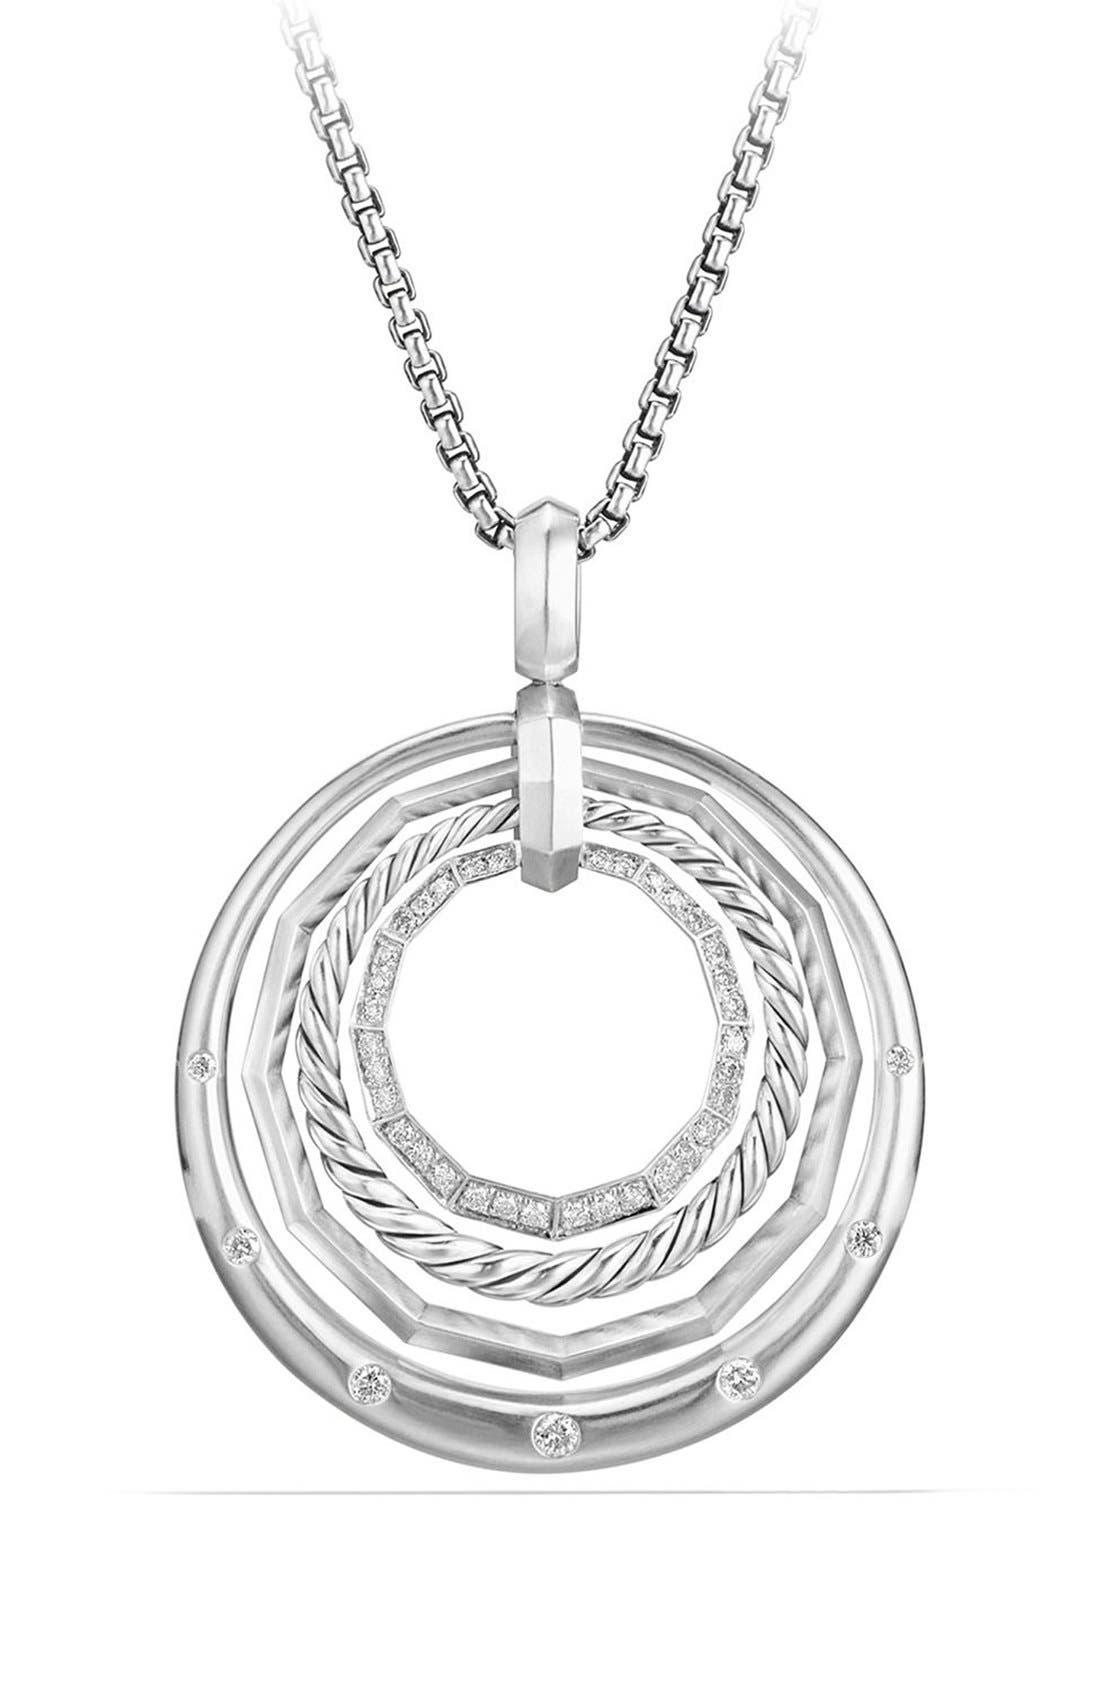 David Yurman Stax Diamond Pendant Necklace